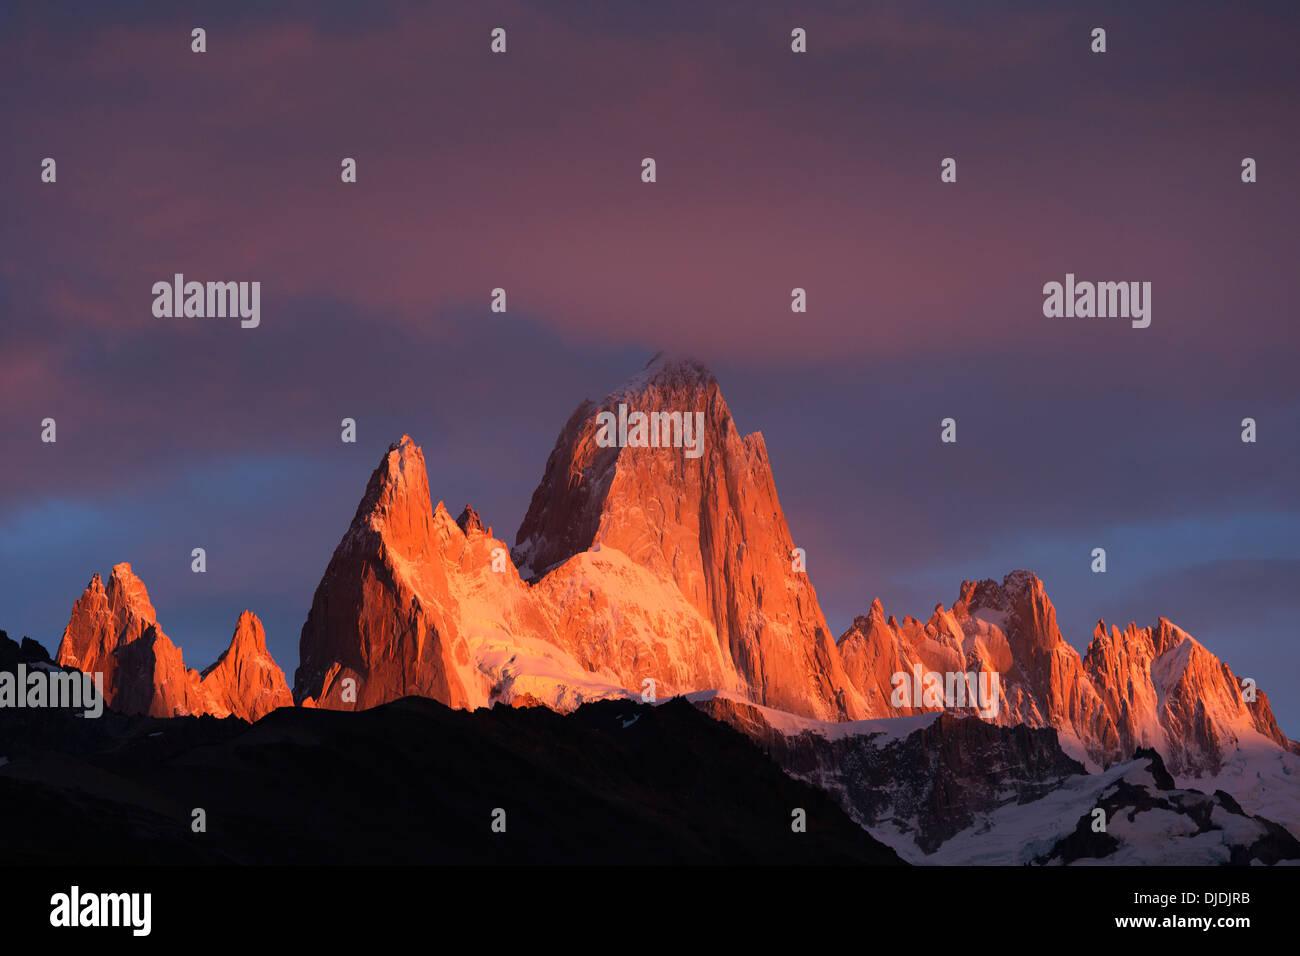 Sunlight catching the peaks of Fitz Roy Massif.Pategonia.Argentina - Stock Image